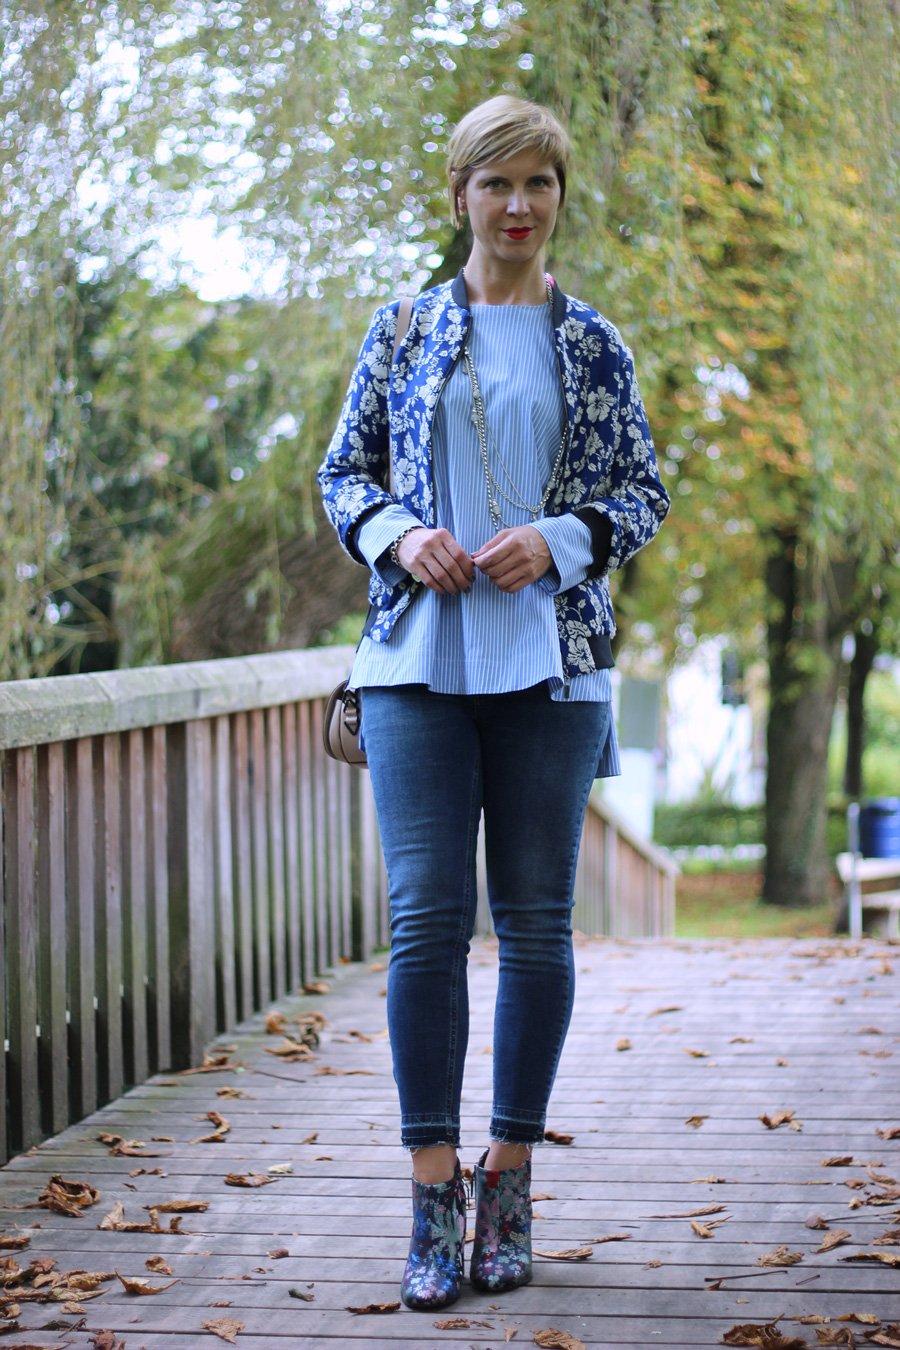 Ankle-Jeans, Ankle-Boots, Streifenbluse, Zara, Sam Edelman, Blau, Conny Doll, Herbstlook